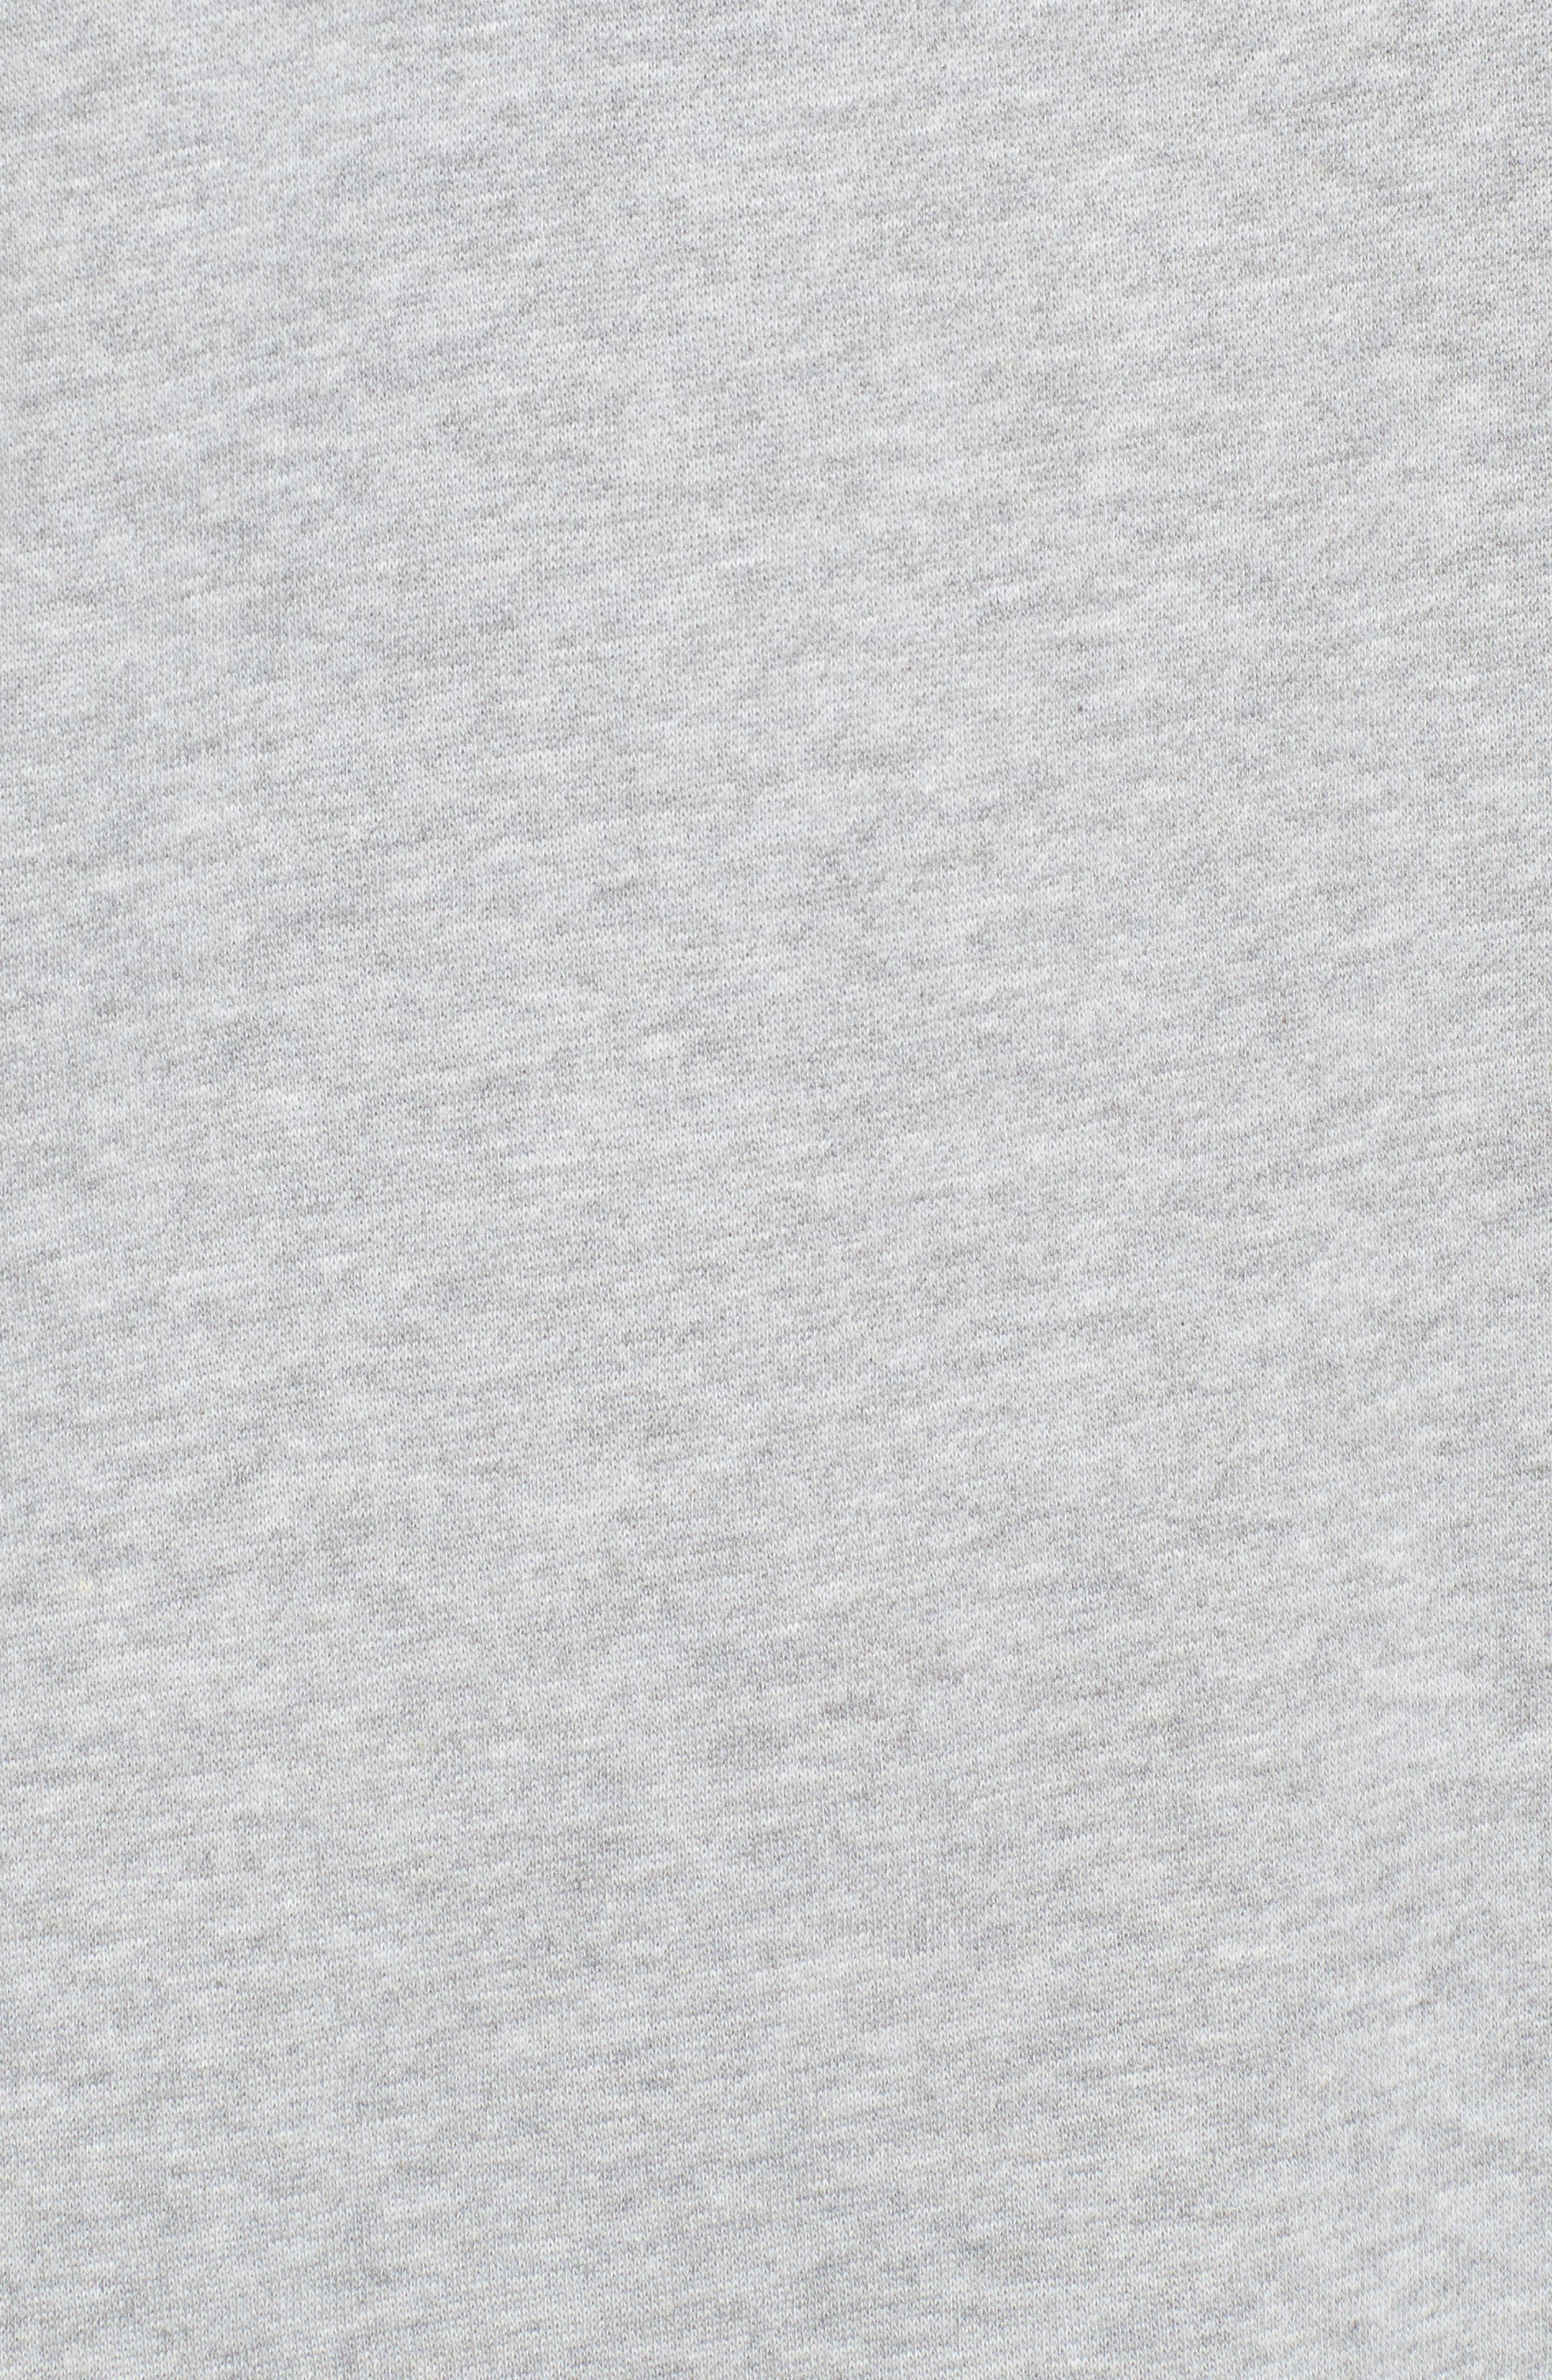 Ruched Sleeve Sweatshirt Dress,                             Alternate thumbnail 5, color,                             020